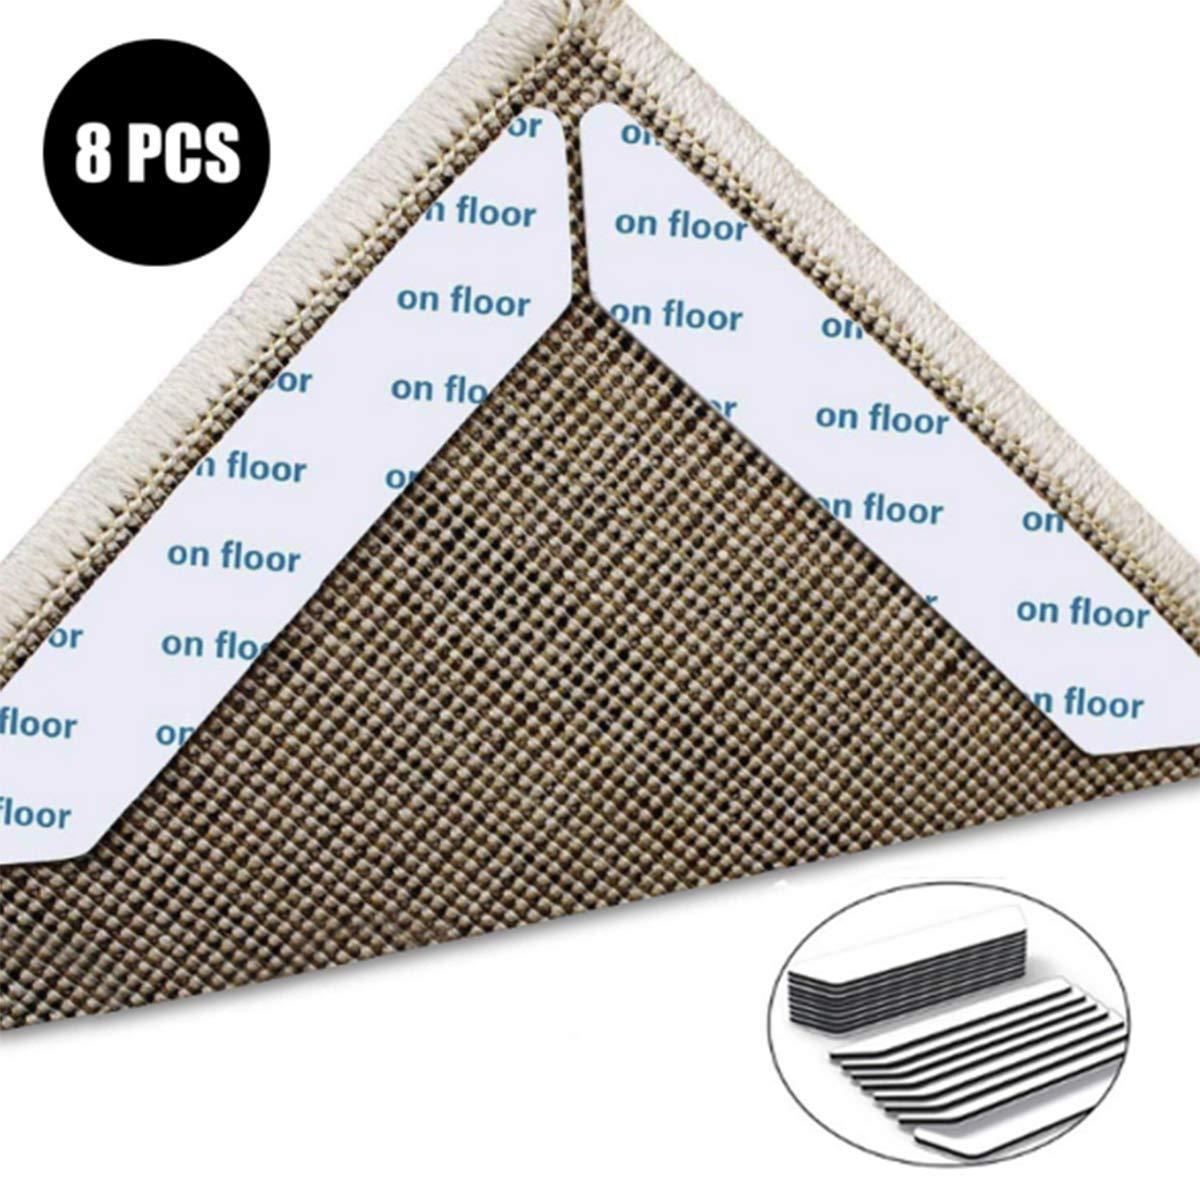 Non Slip Rug Grip 8 PCS Carpet Corner Pad Reusable Non Slip Sticker Anti Curling with Strong zhouzhouji Rug Gripper white Reusable Rug Tape Anti Rug Slip for Carpets